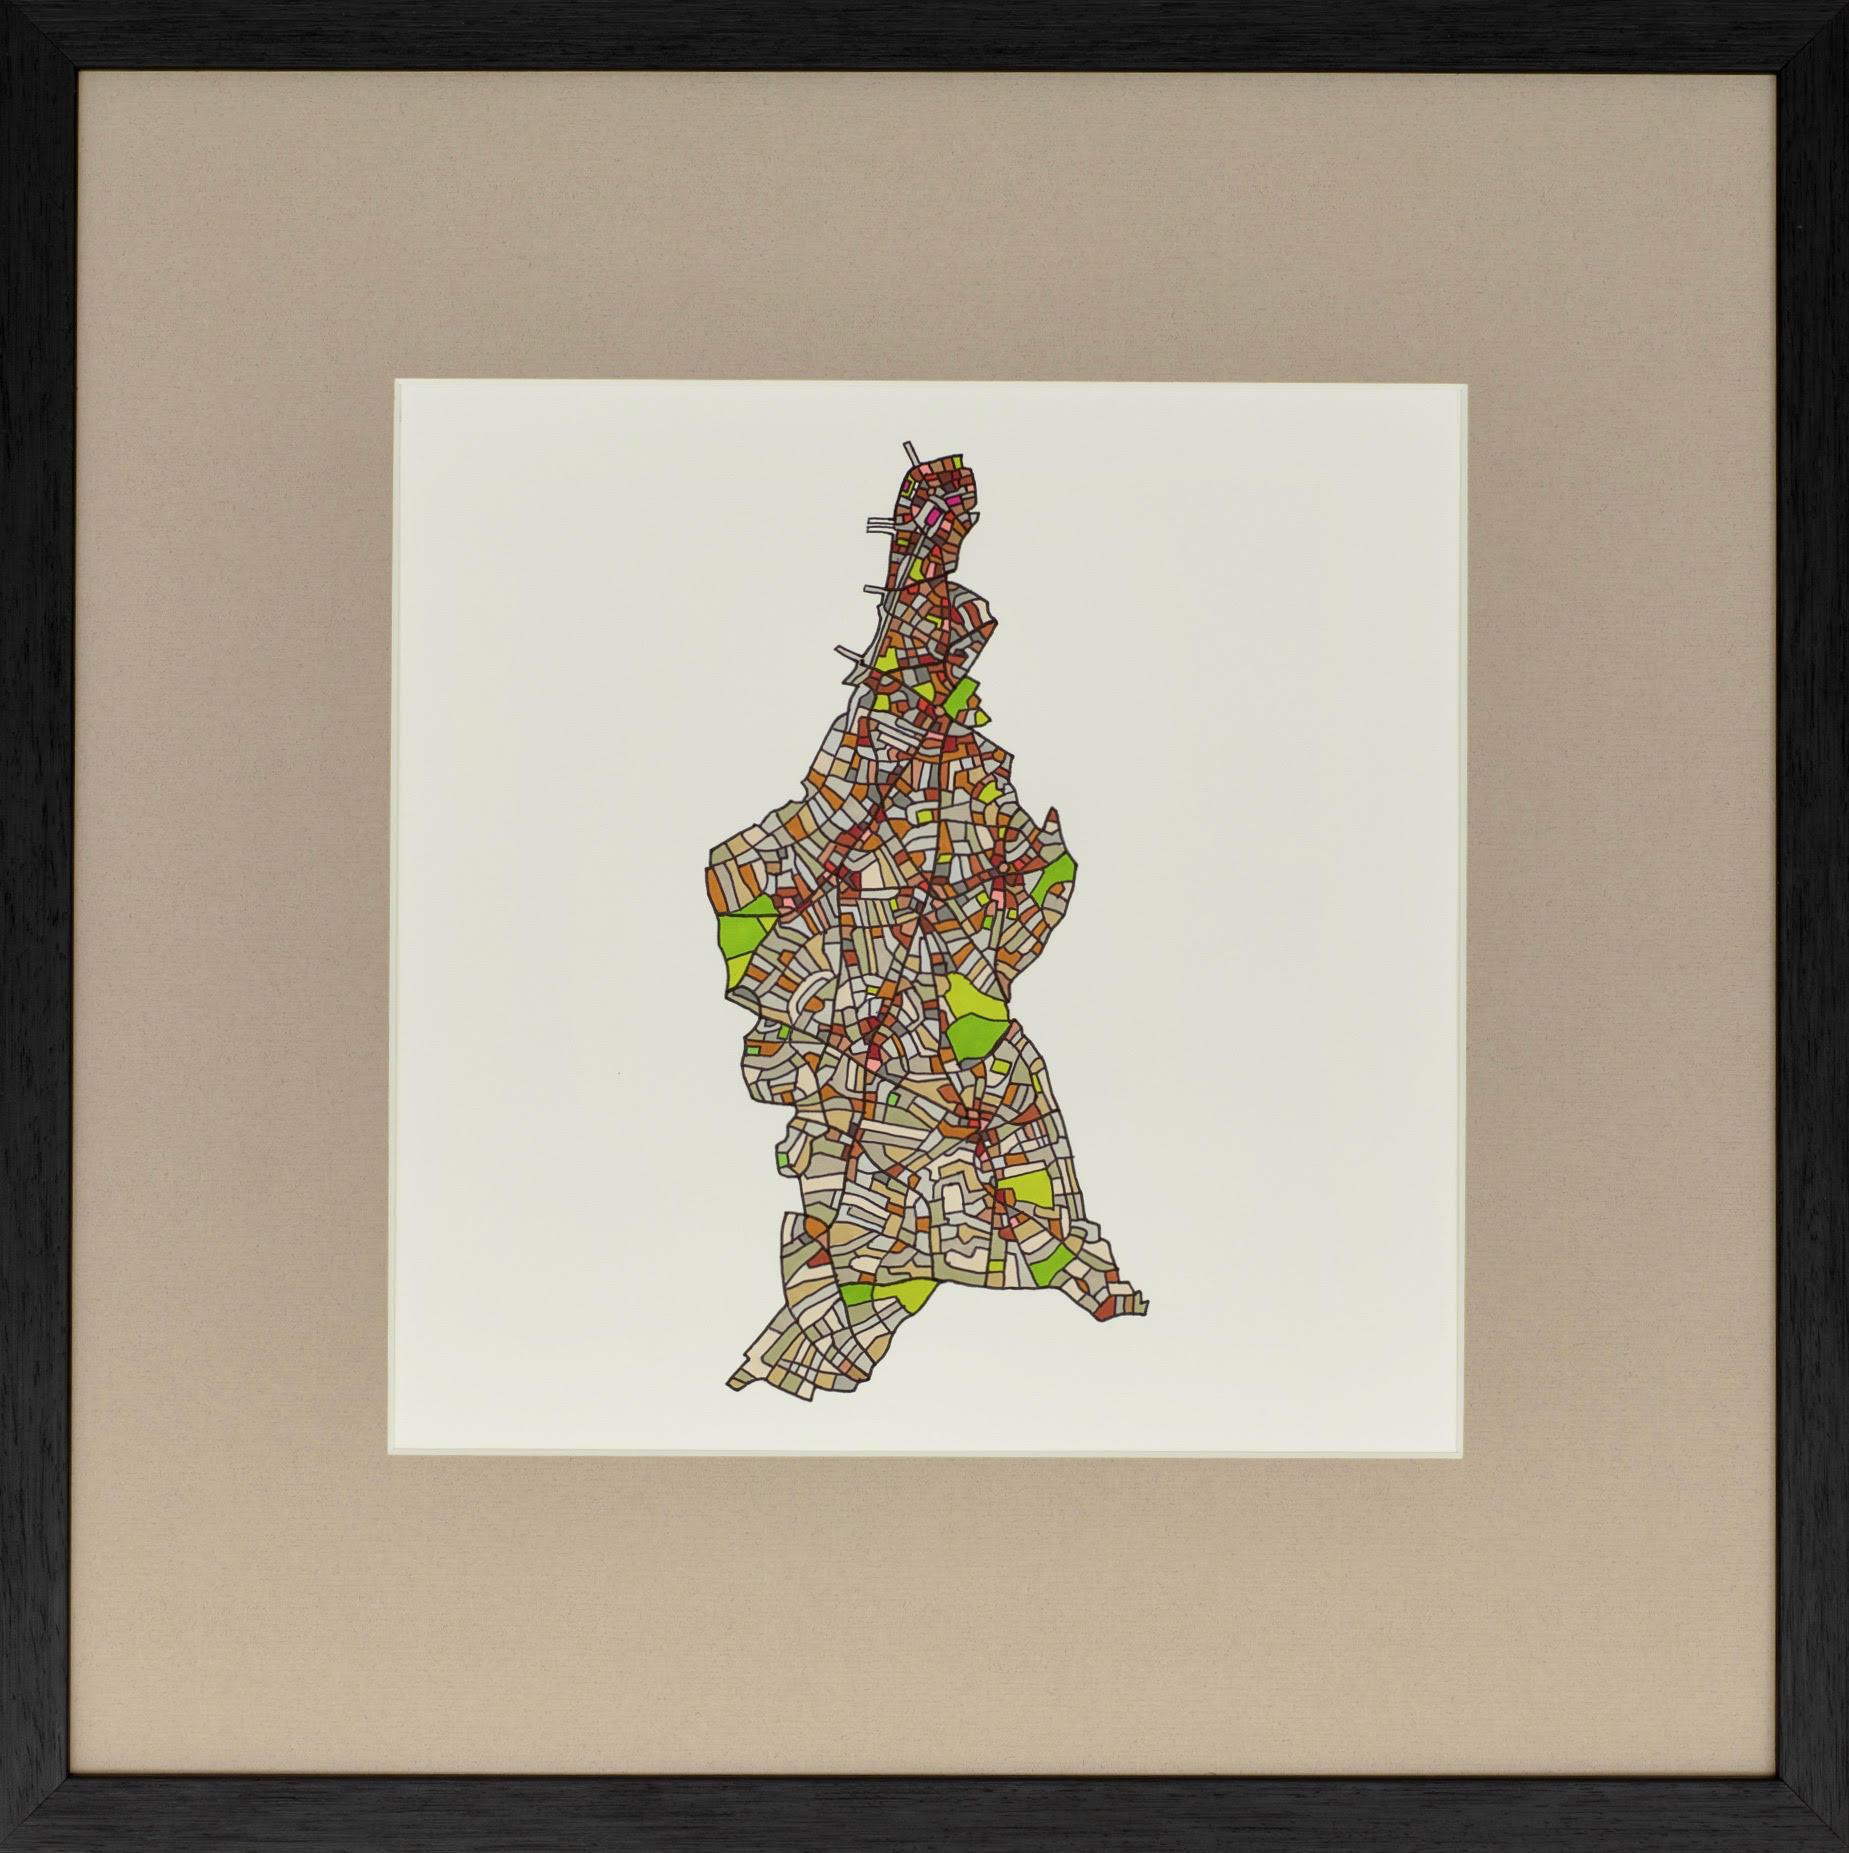 London Borough of Lambeth, 2018 | Ink on Paper | 44 x 44 cm | £450 (framed)